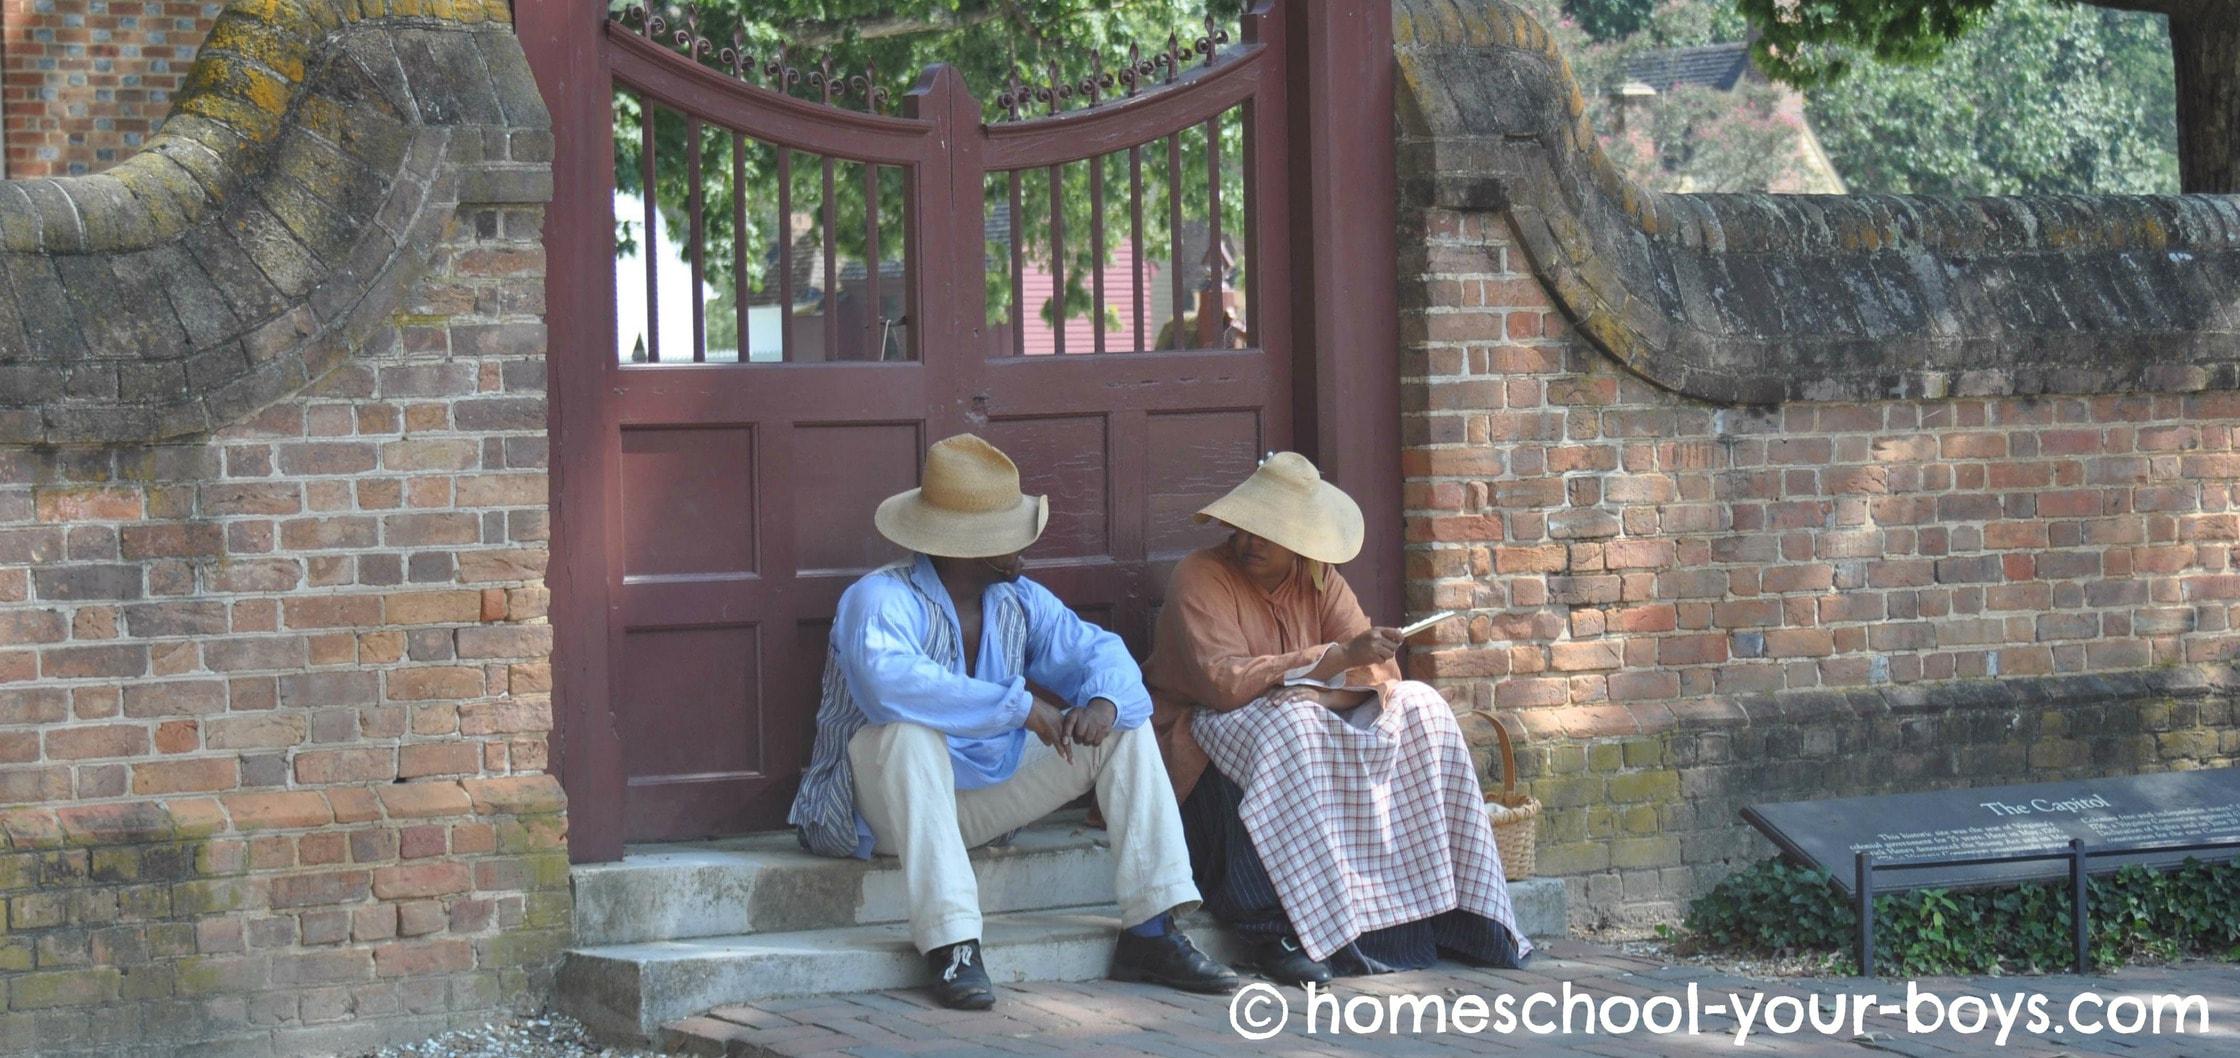 Homeschool Vacation – Colonial Williamsburg